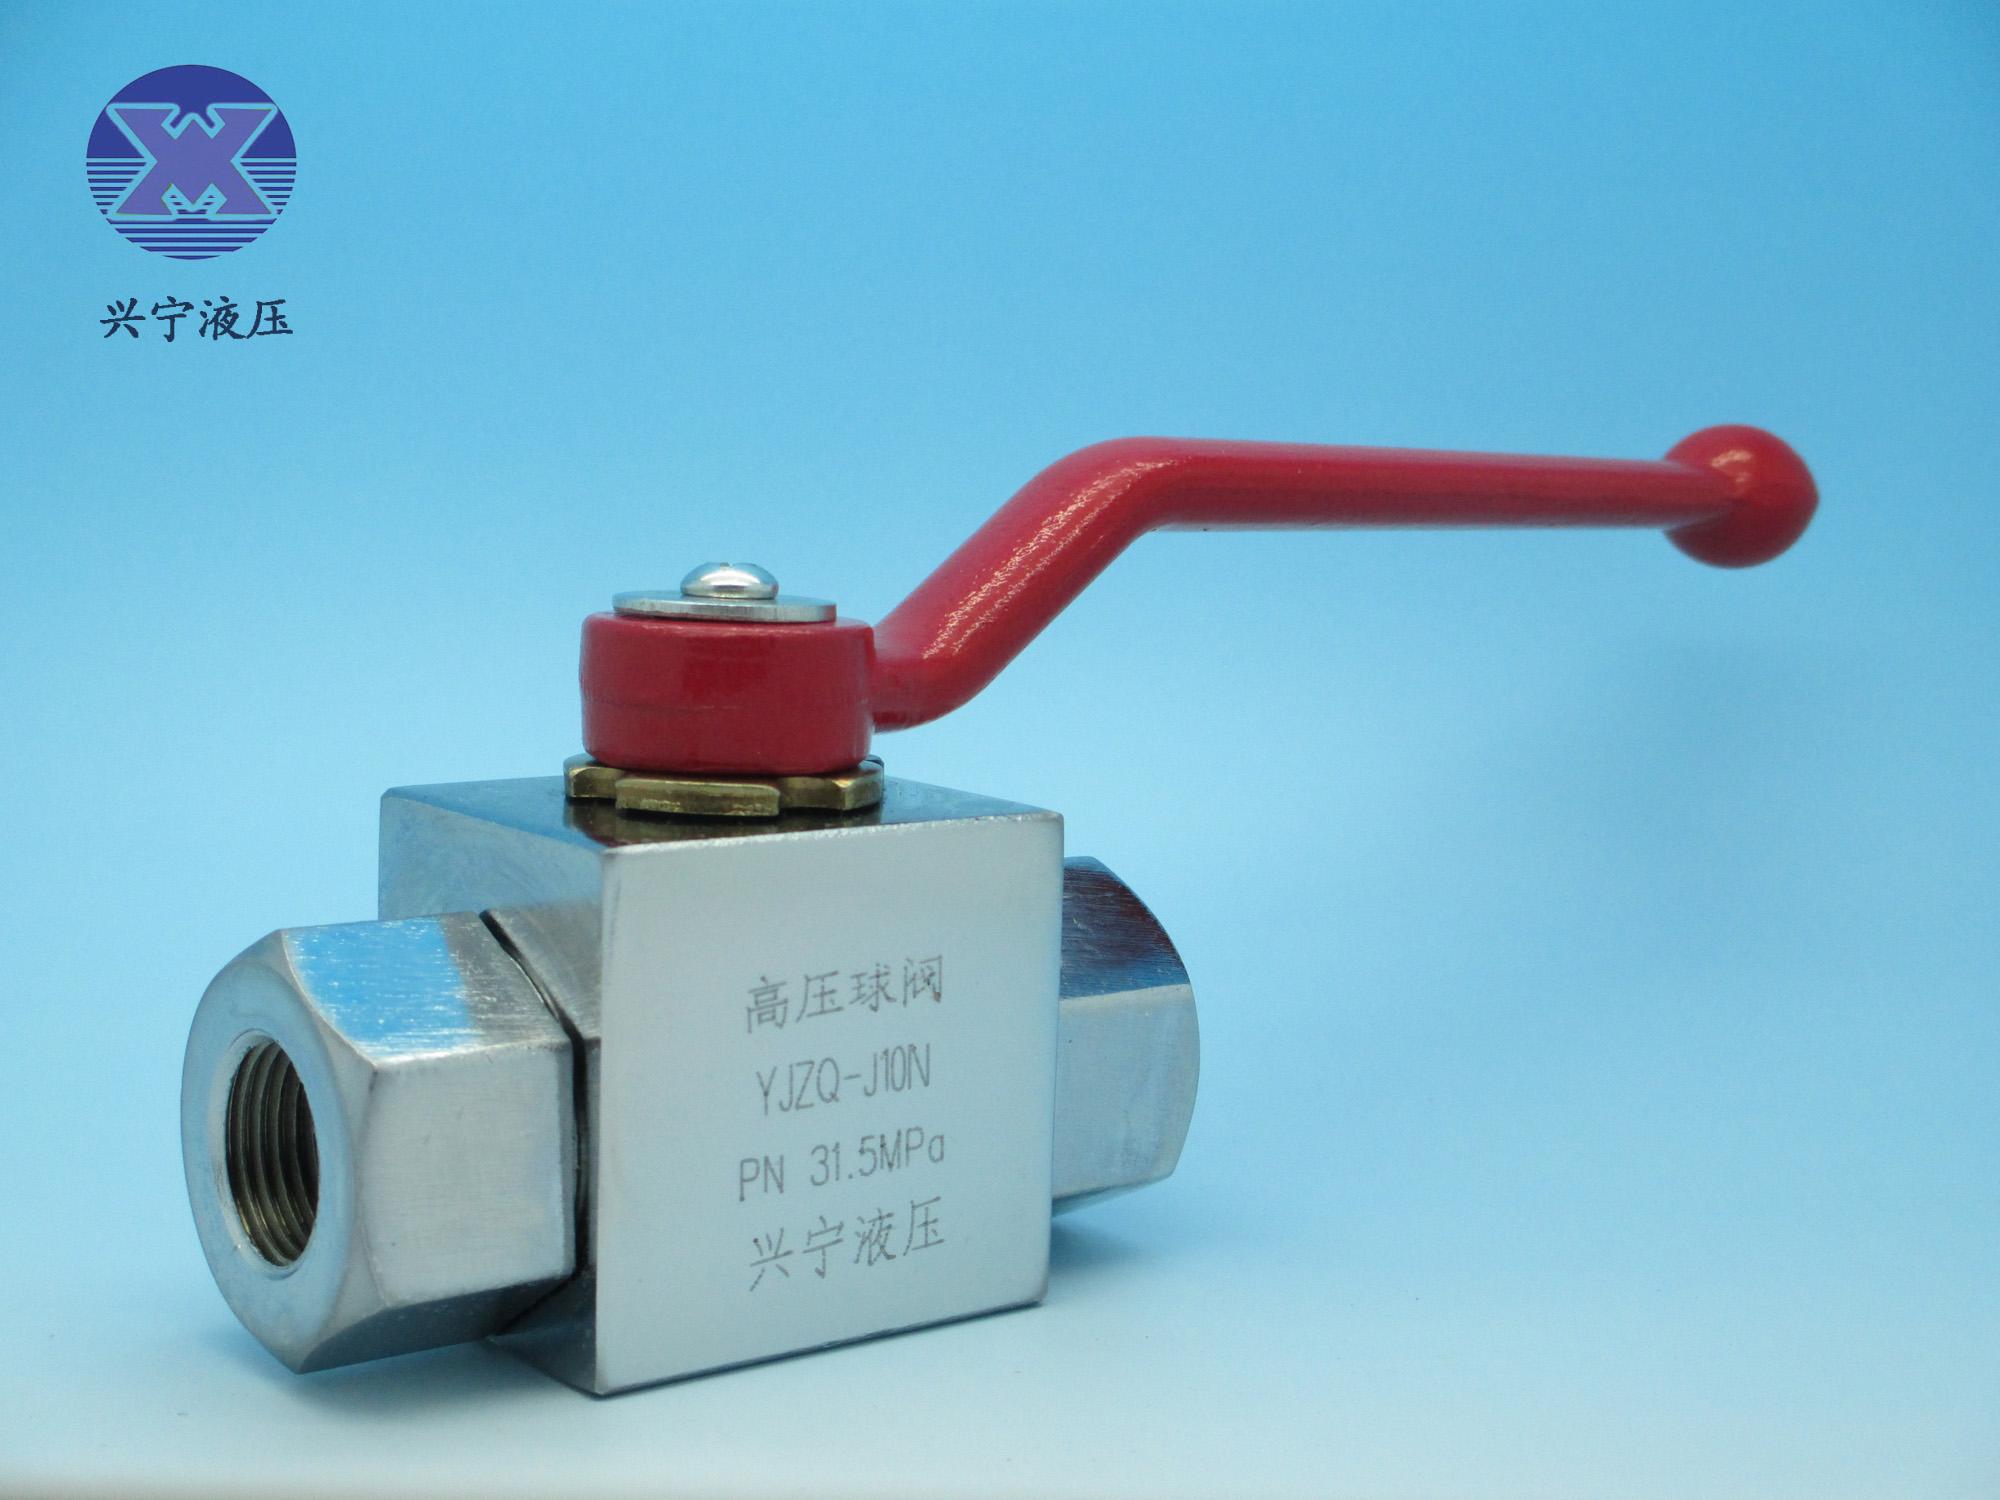 YJZQ型高压液压球阀YJZQ-J10N